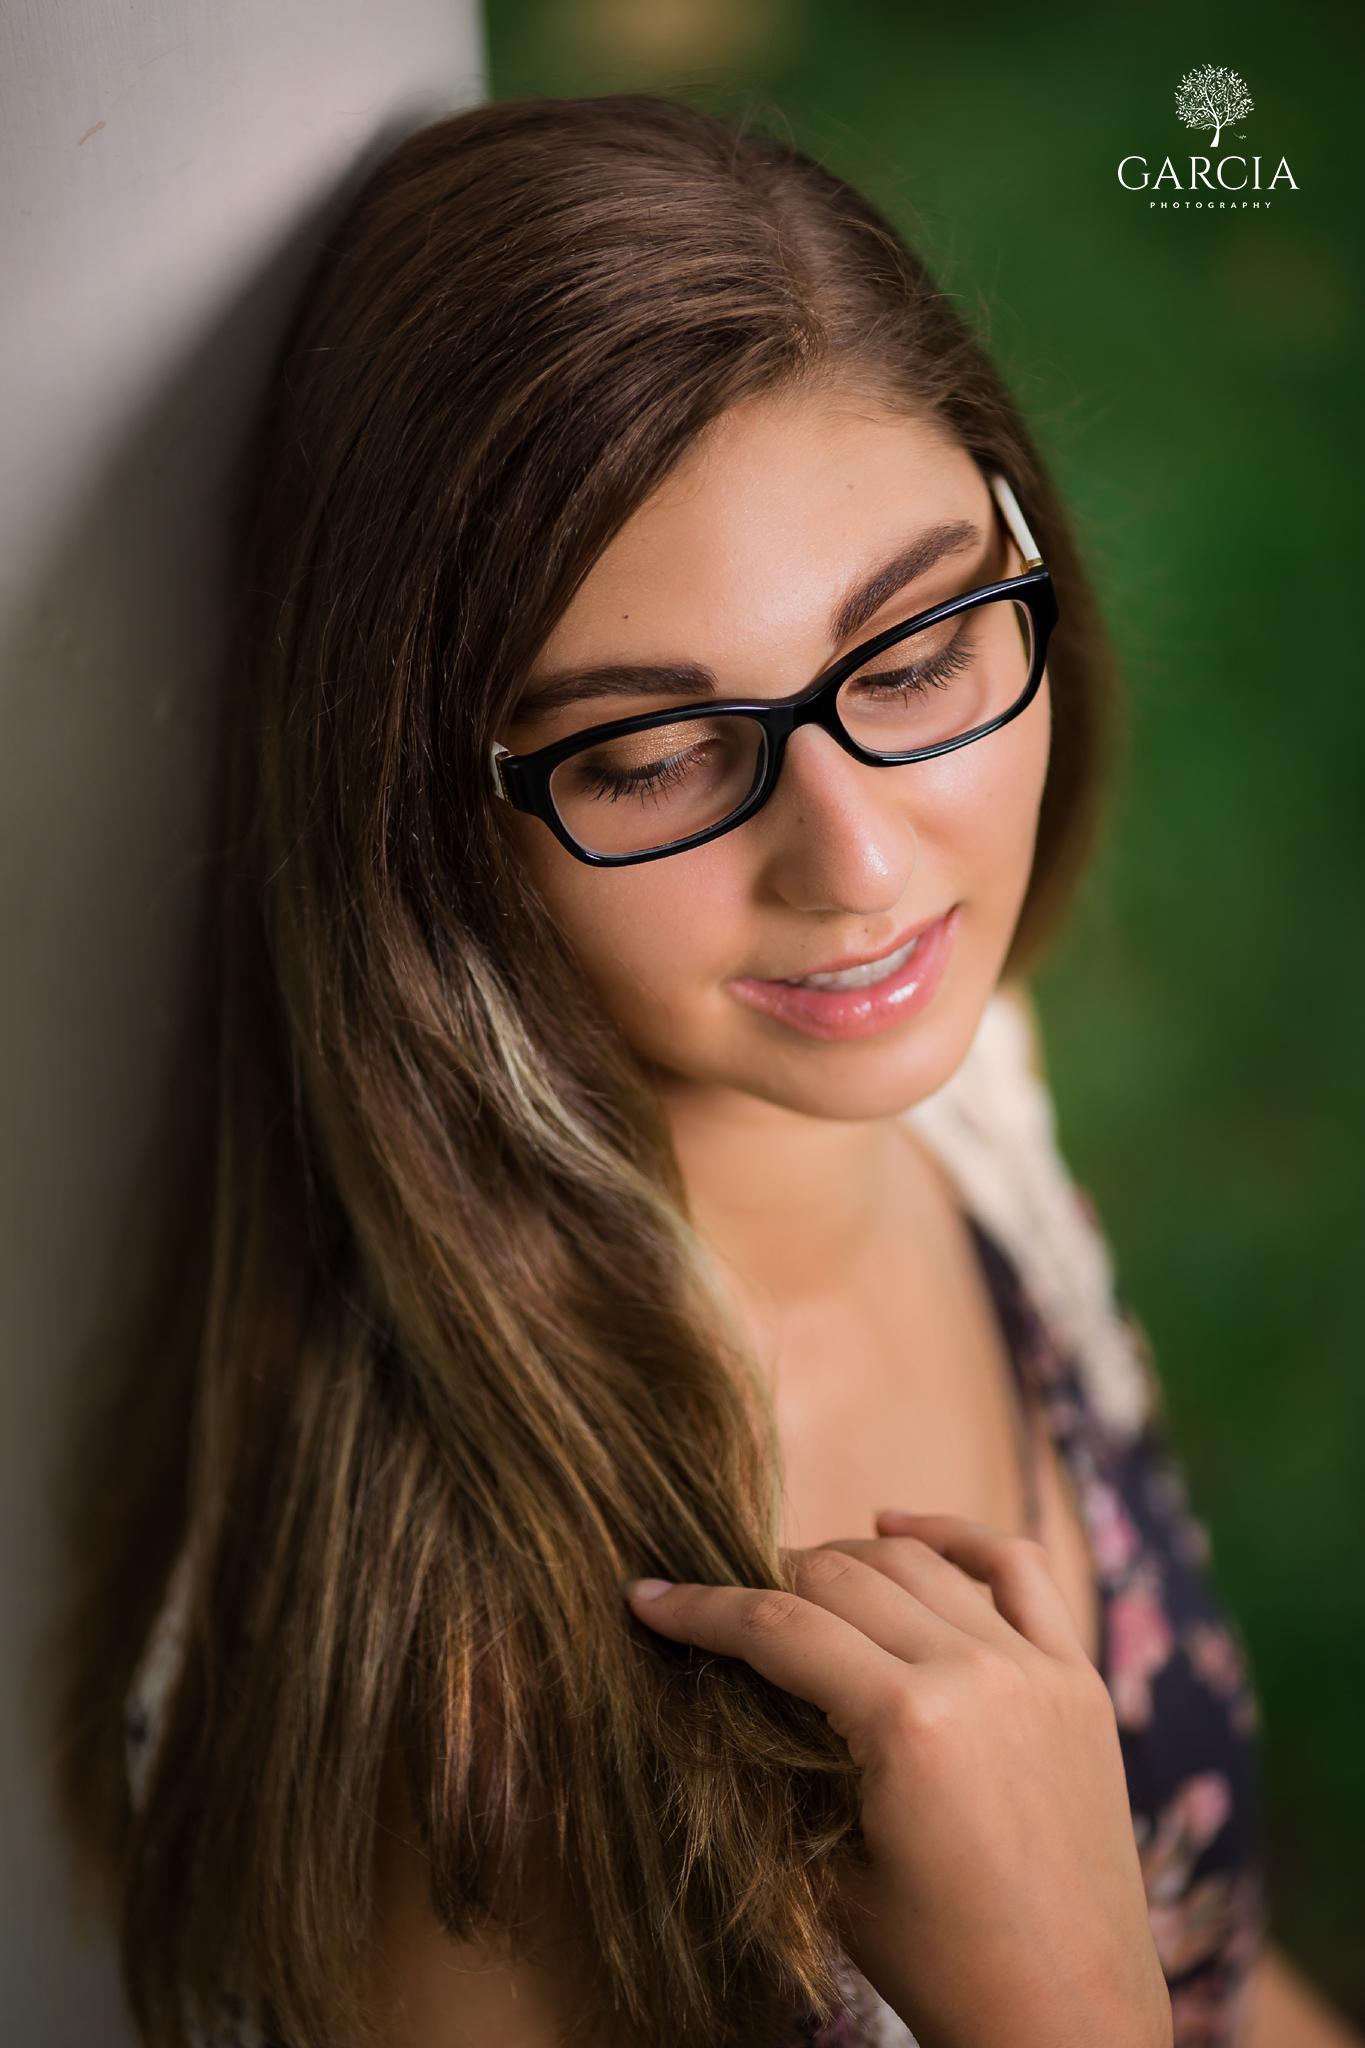 Emily-Sweet-16-Portrait-Garcia-Photography-1197.jpg